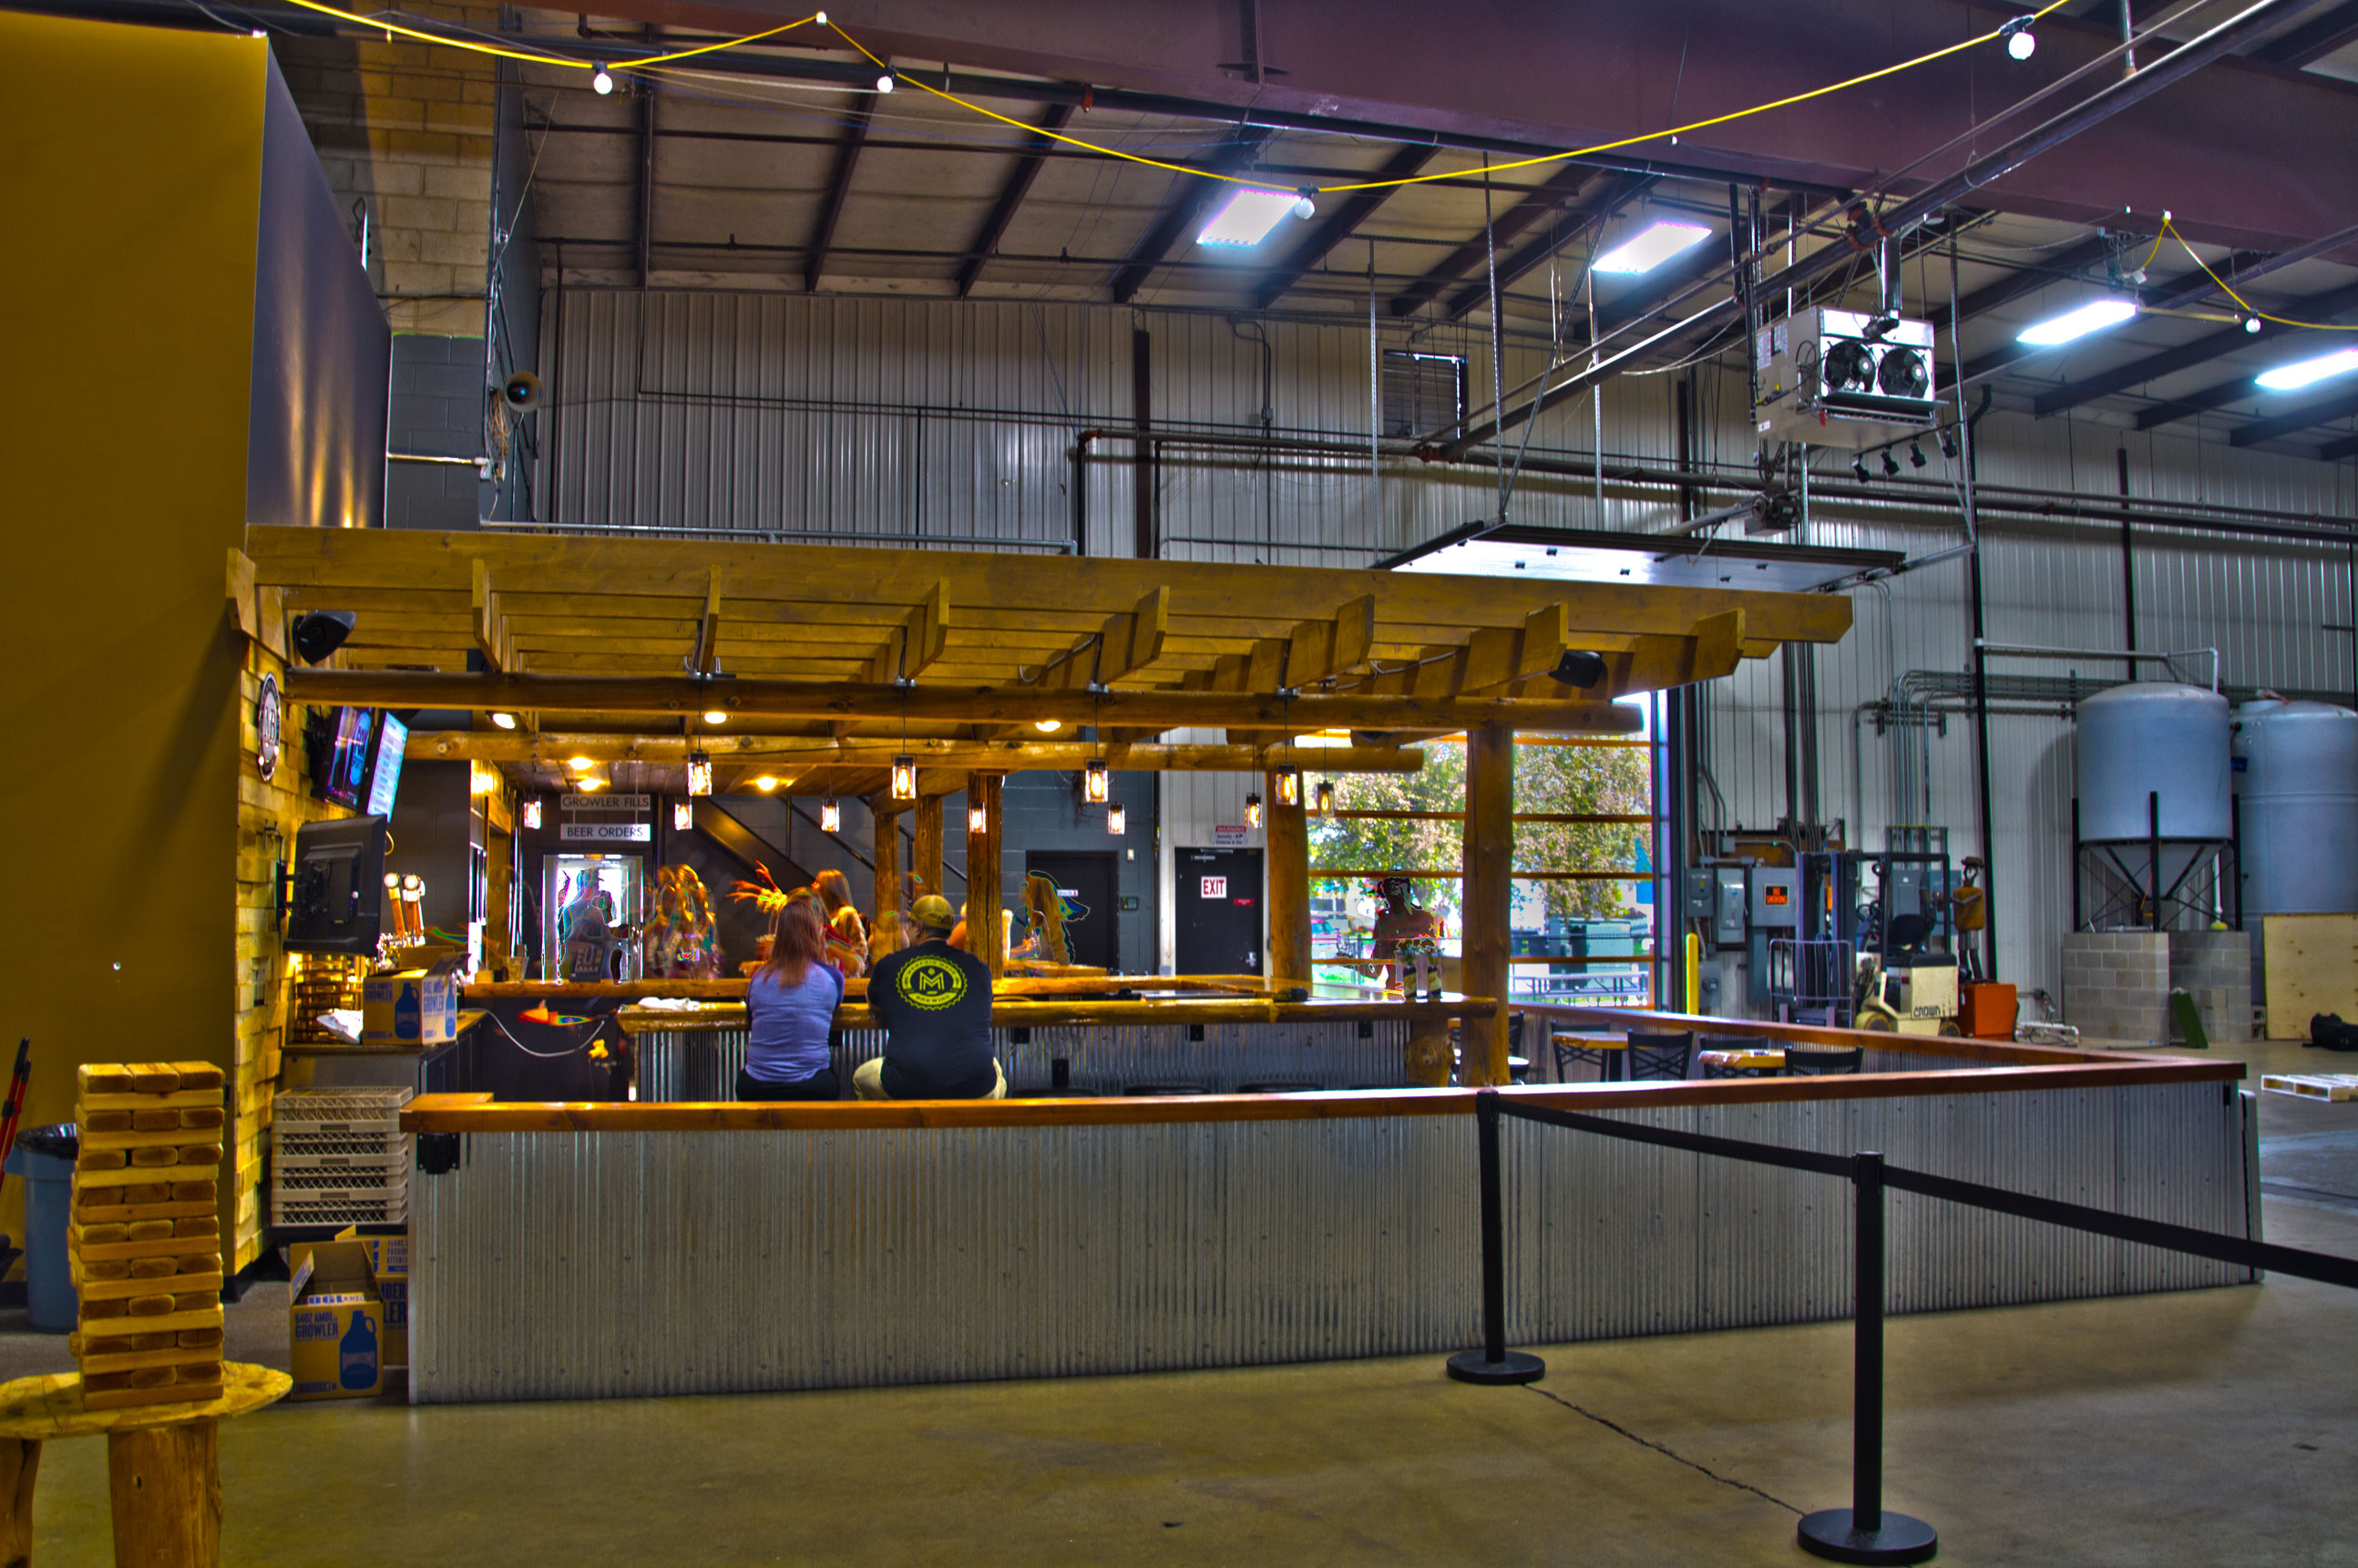 mankato-brewery-4-lg.jpg